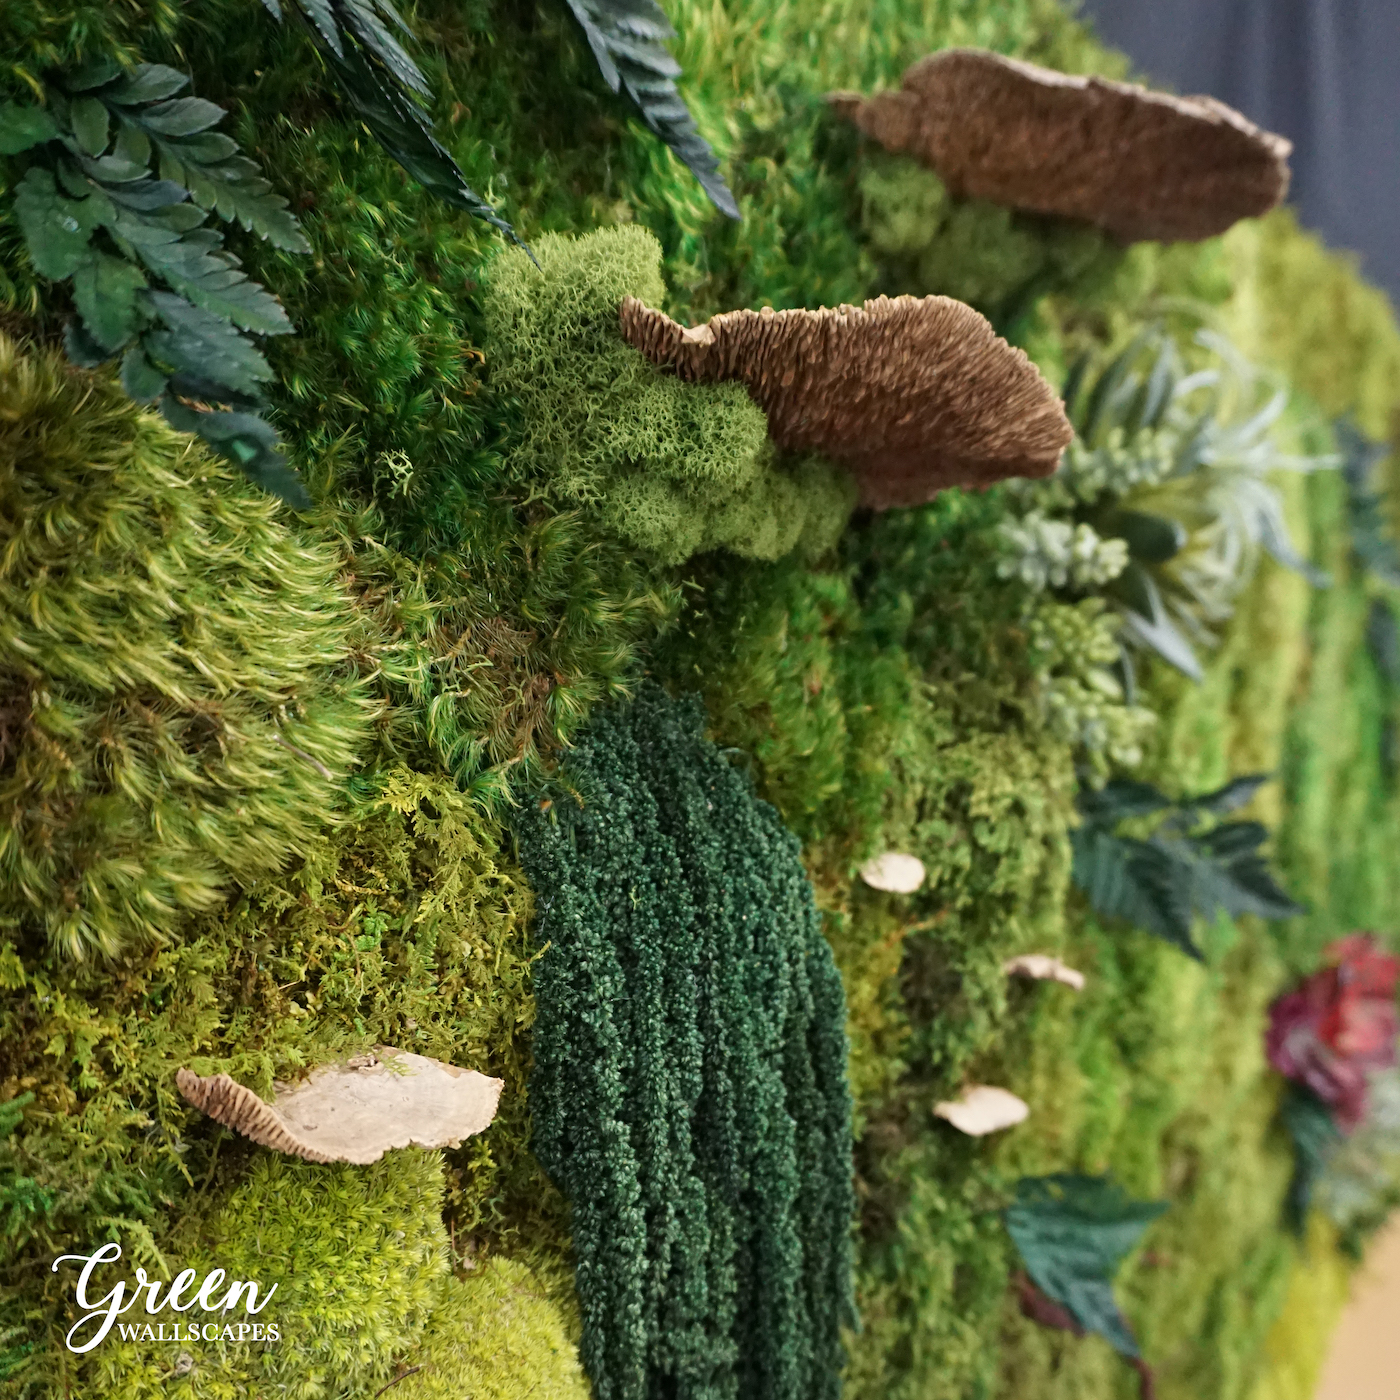 mushroom_close_up.jpg